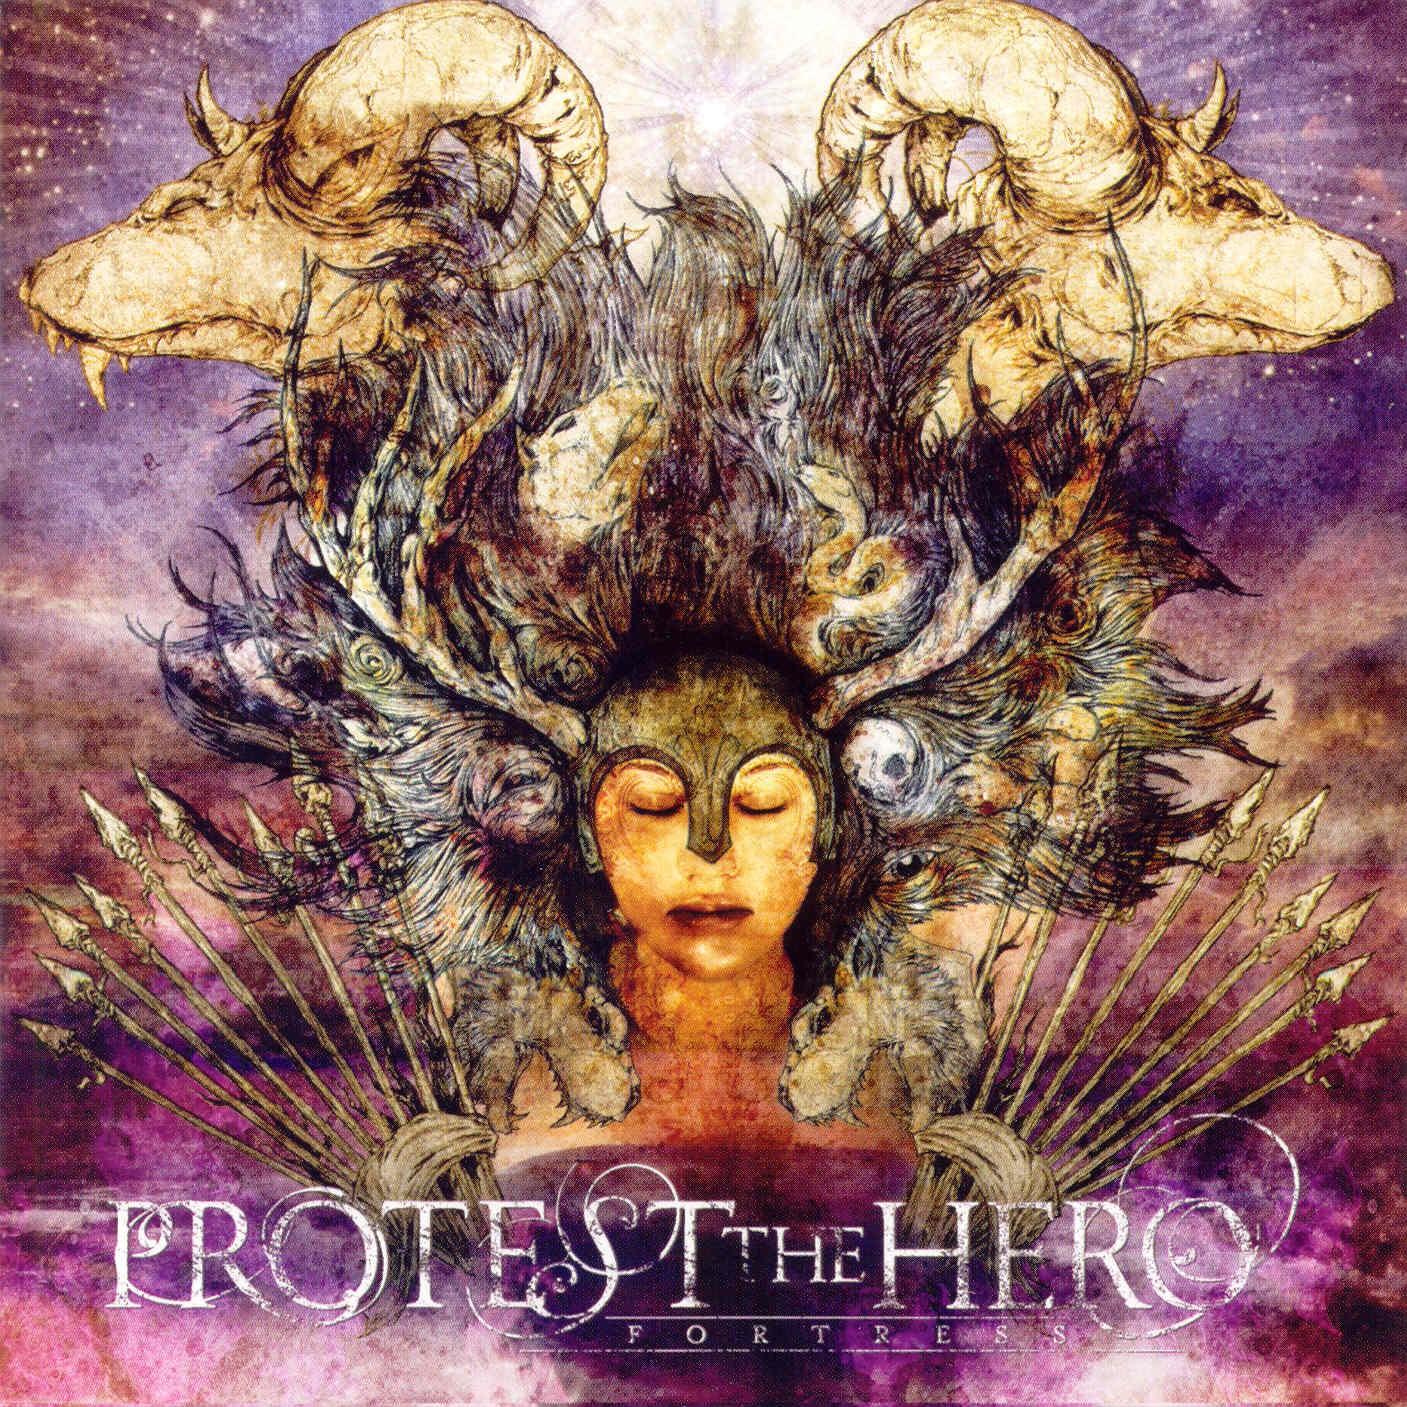 http://1.bp.blogspot.com/-kh2NXEwmQfA/Tm-zYG94yFI/AAAAAAAABcQ/vv7m29_EEh4/s1600/1295521564_allcdcovers_protest_the_hero_fortress_2008_retail_cd-front.jpg